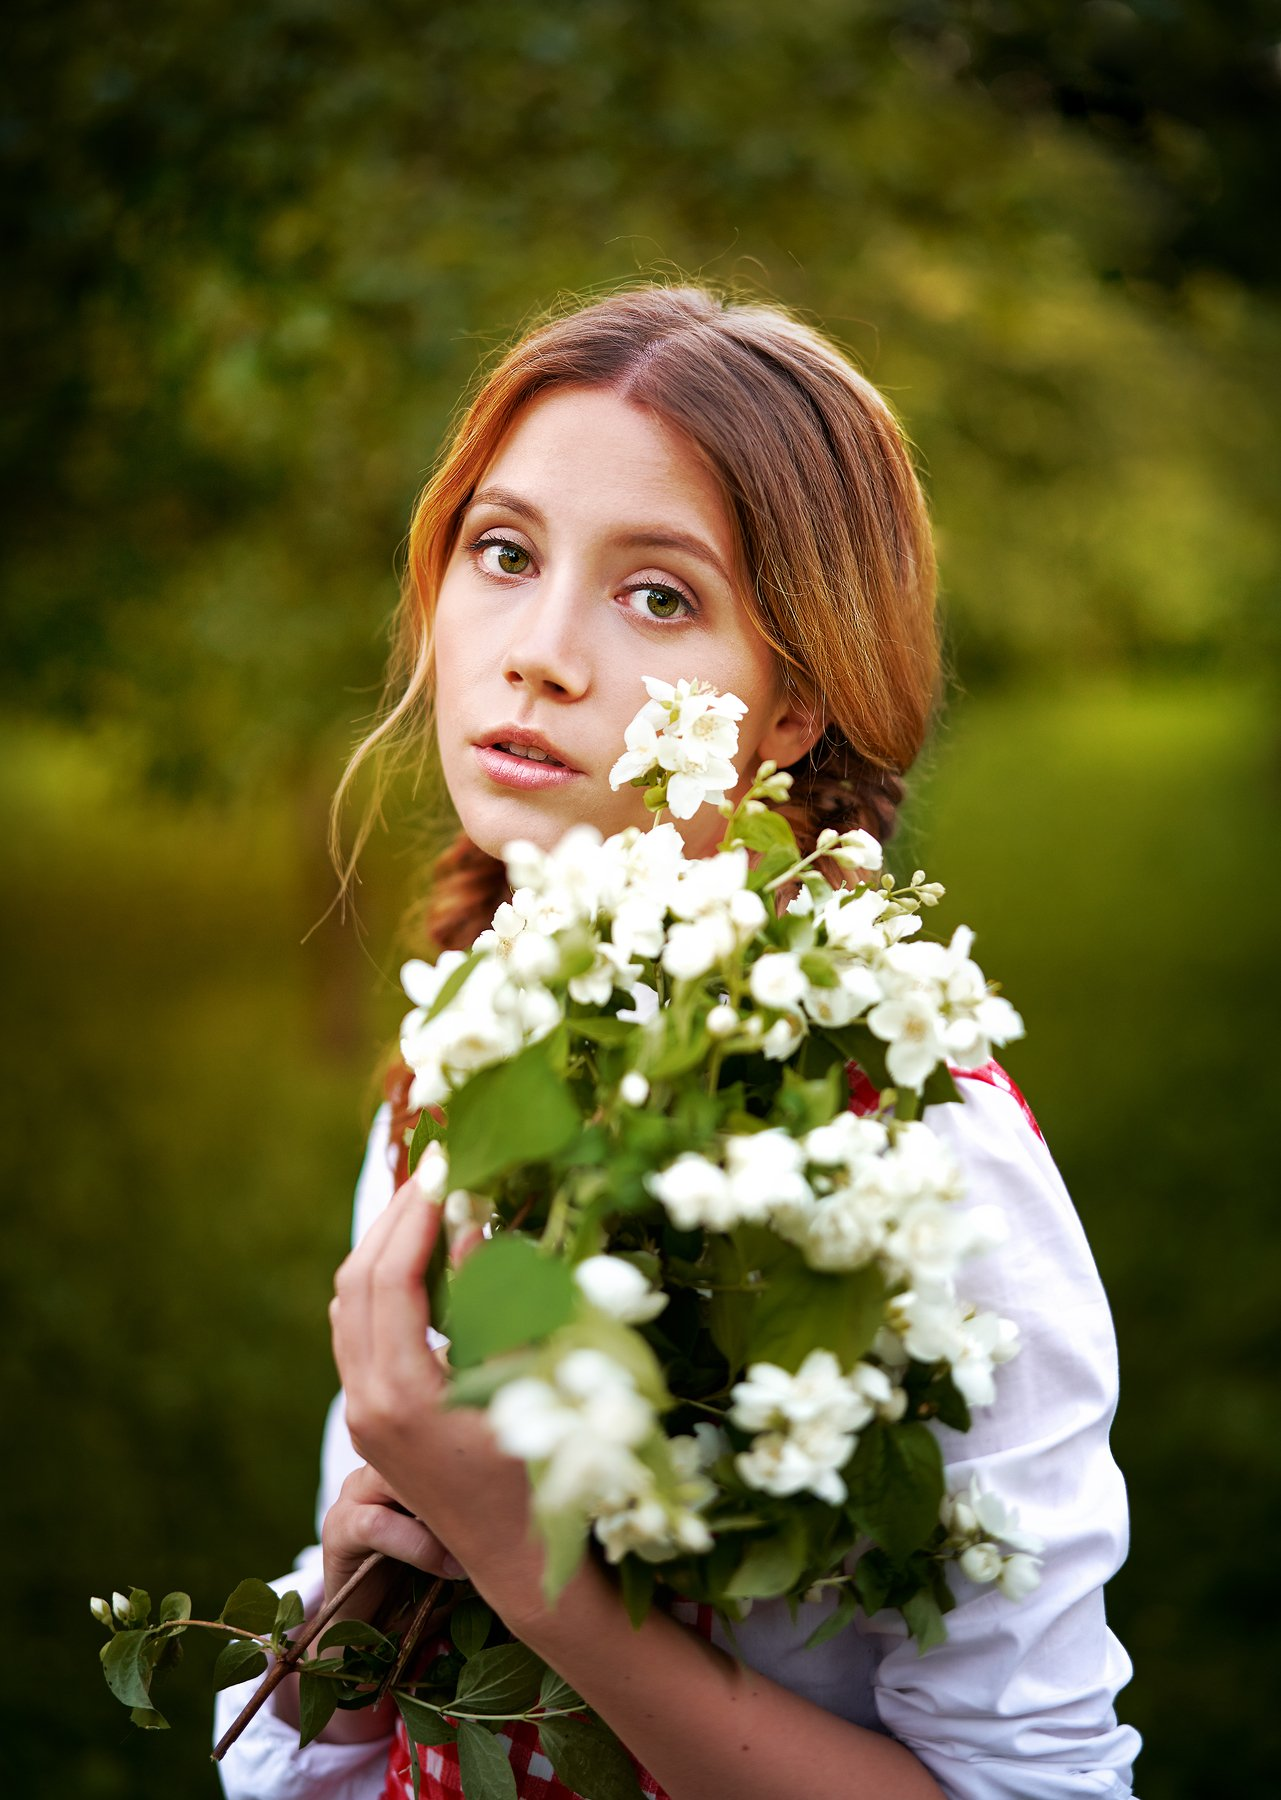 девушка, жасмин, красиво, портрет, лето, Татьяна Сидюкова